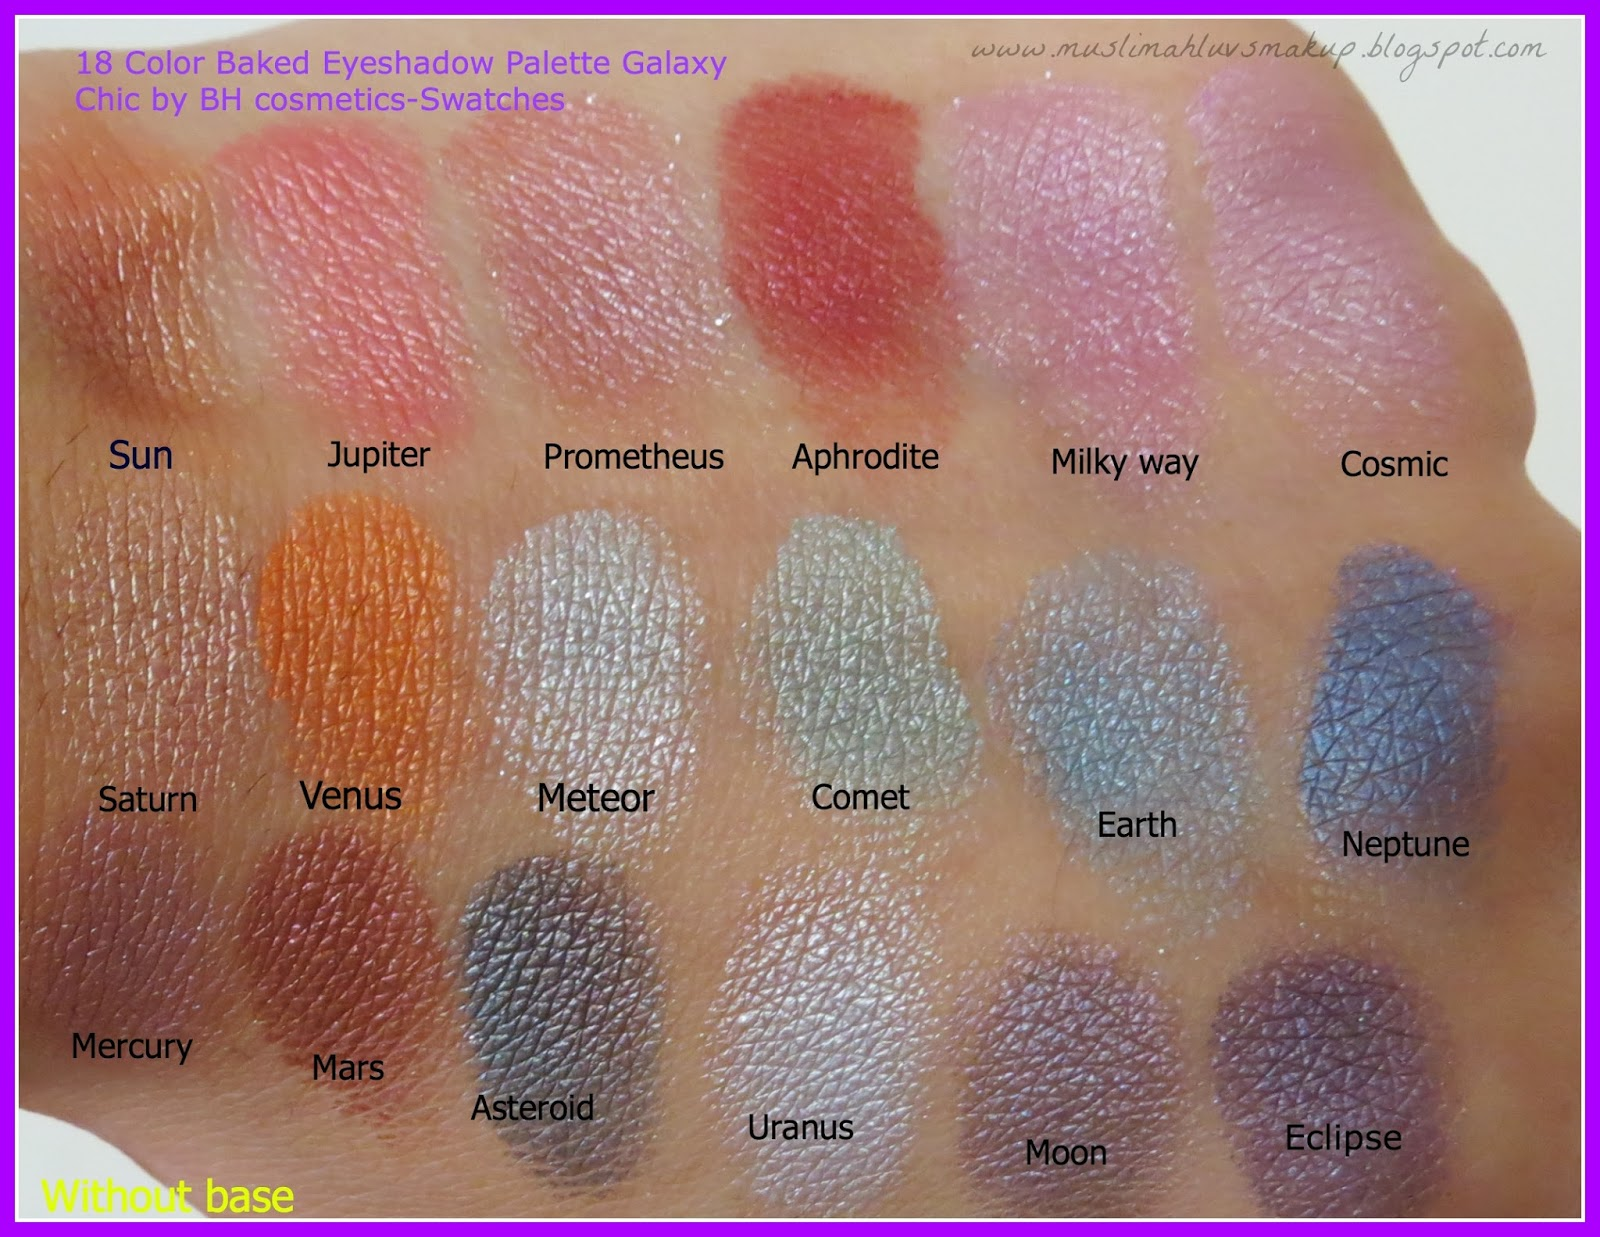 BH COsmetics x ItsMyRayeRaye Eyeshadow, Highlighter & Contour Palette by BH Cosmetics #13